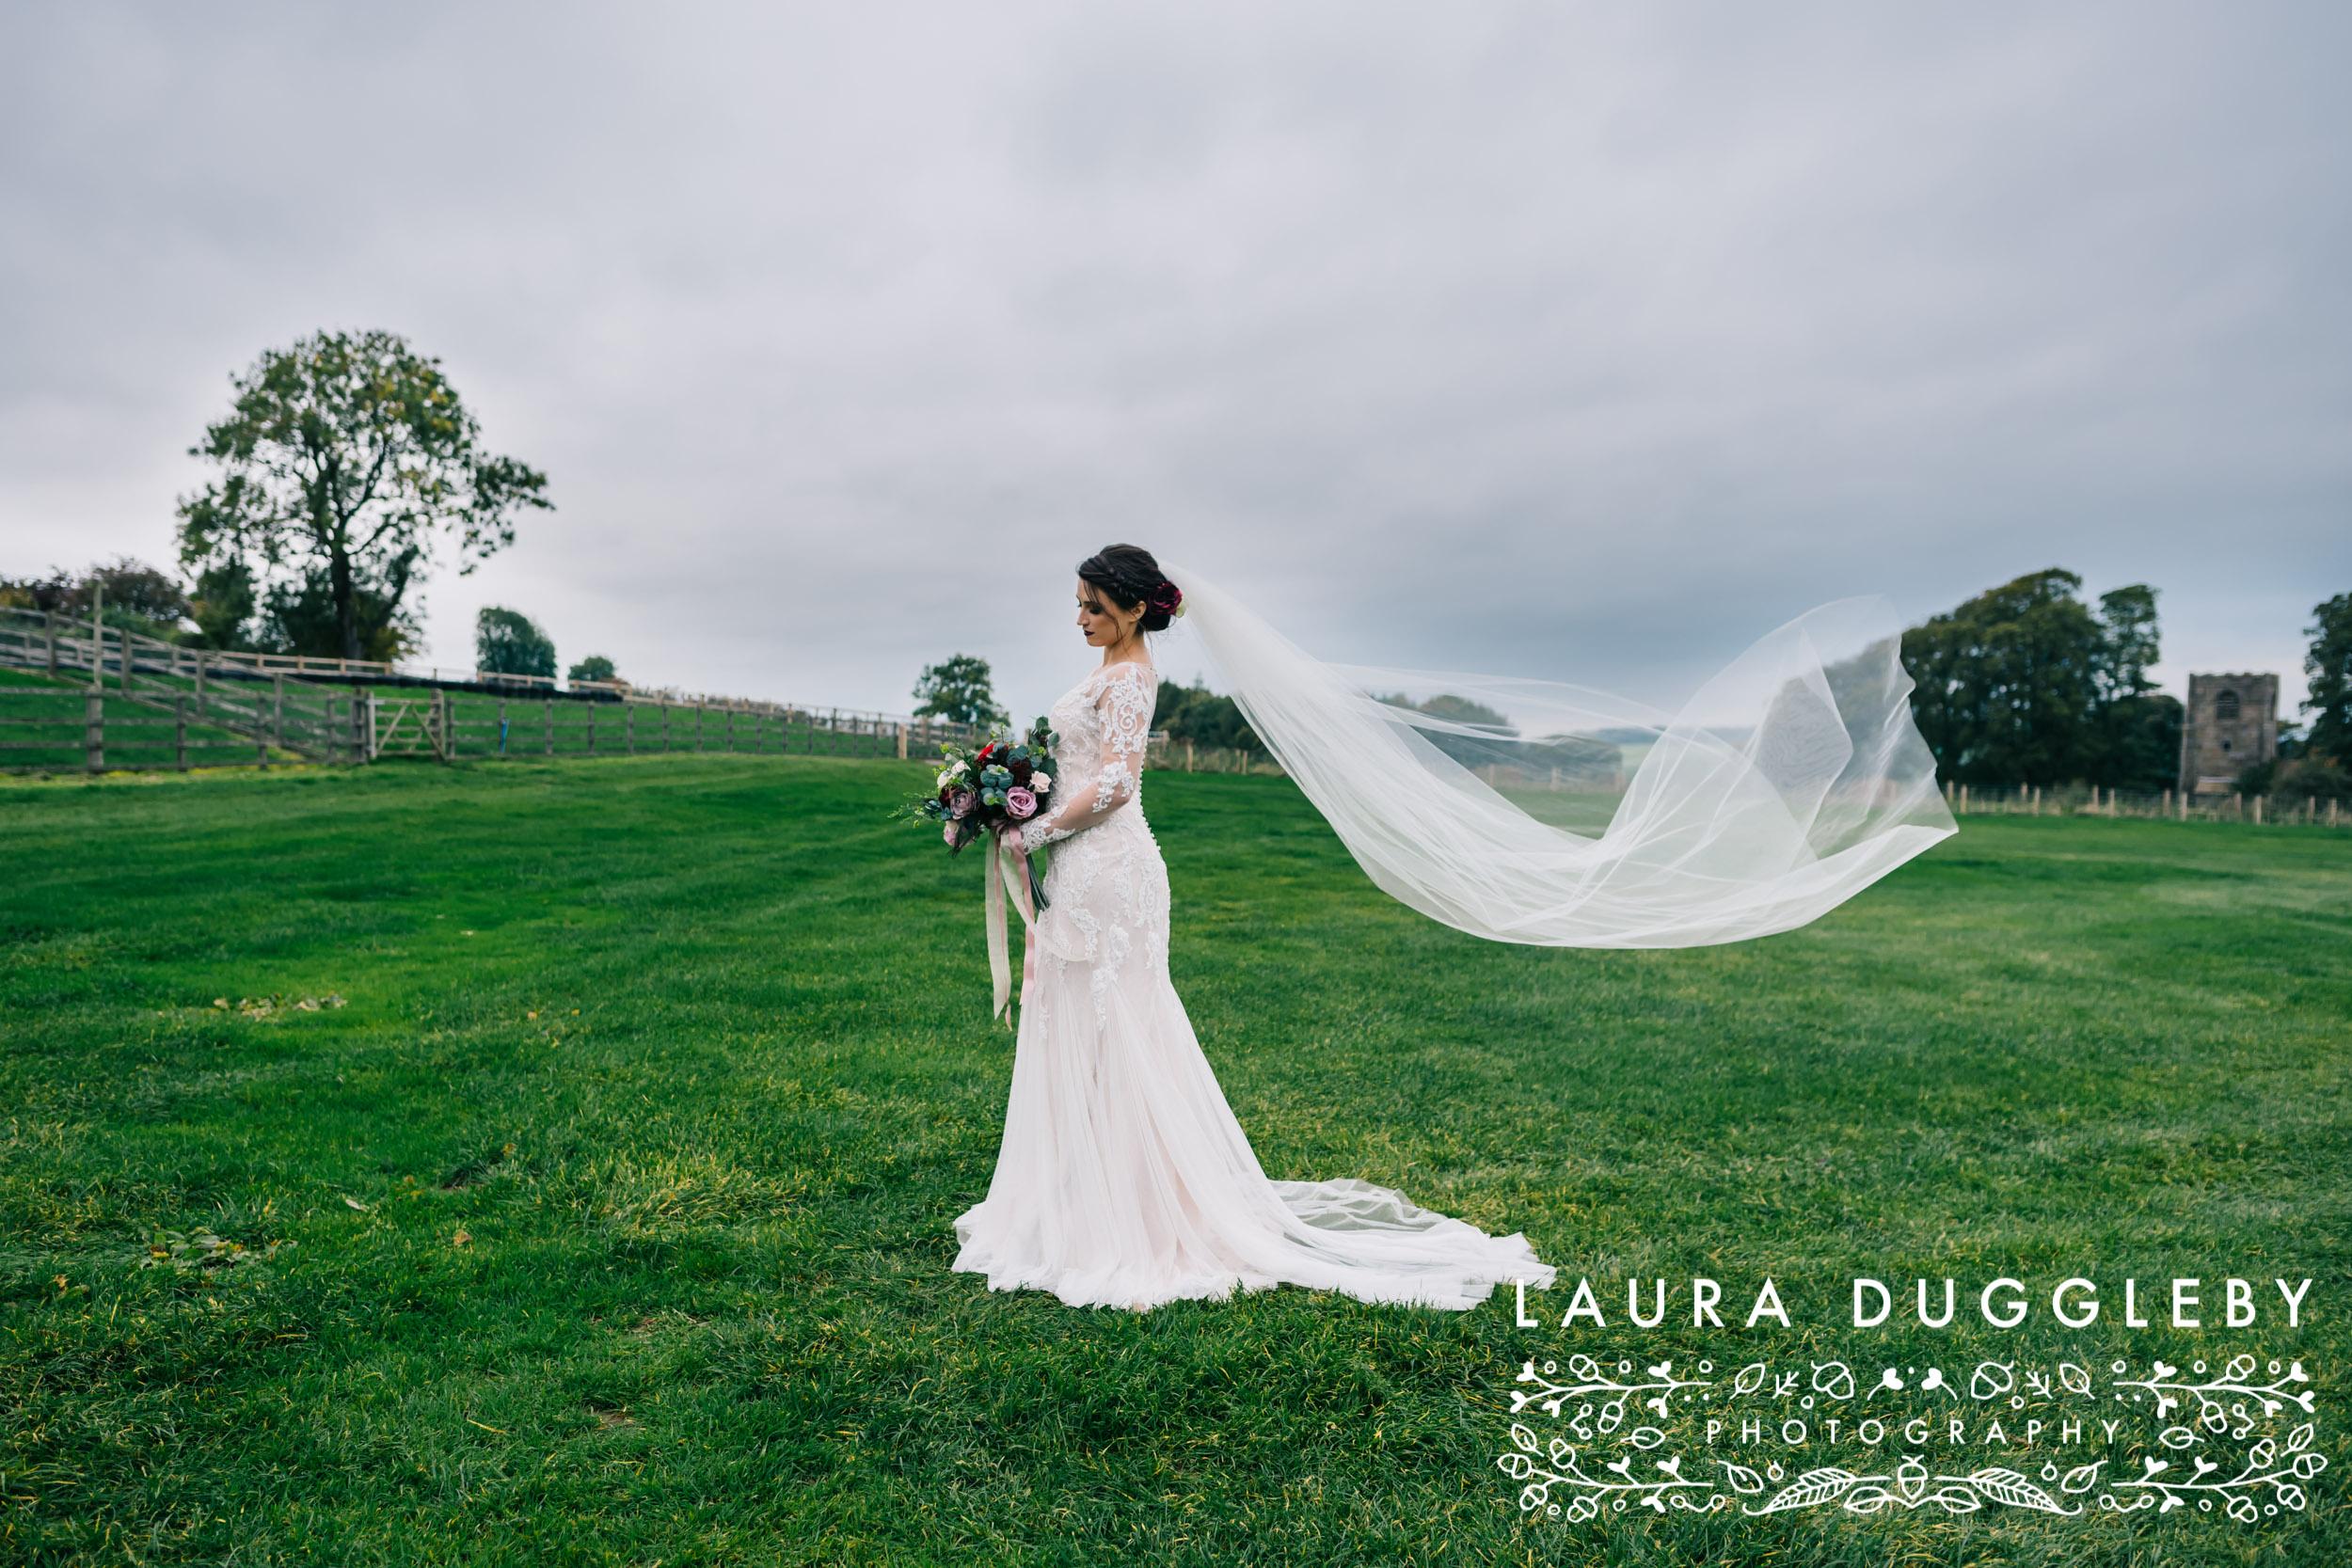 Thornton Hall Country Park - Wedding Photographer27